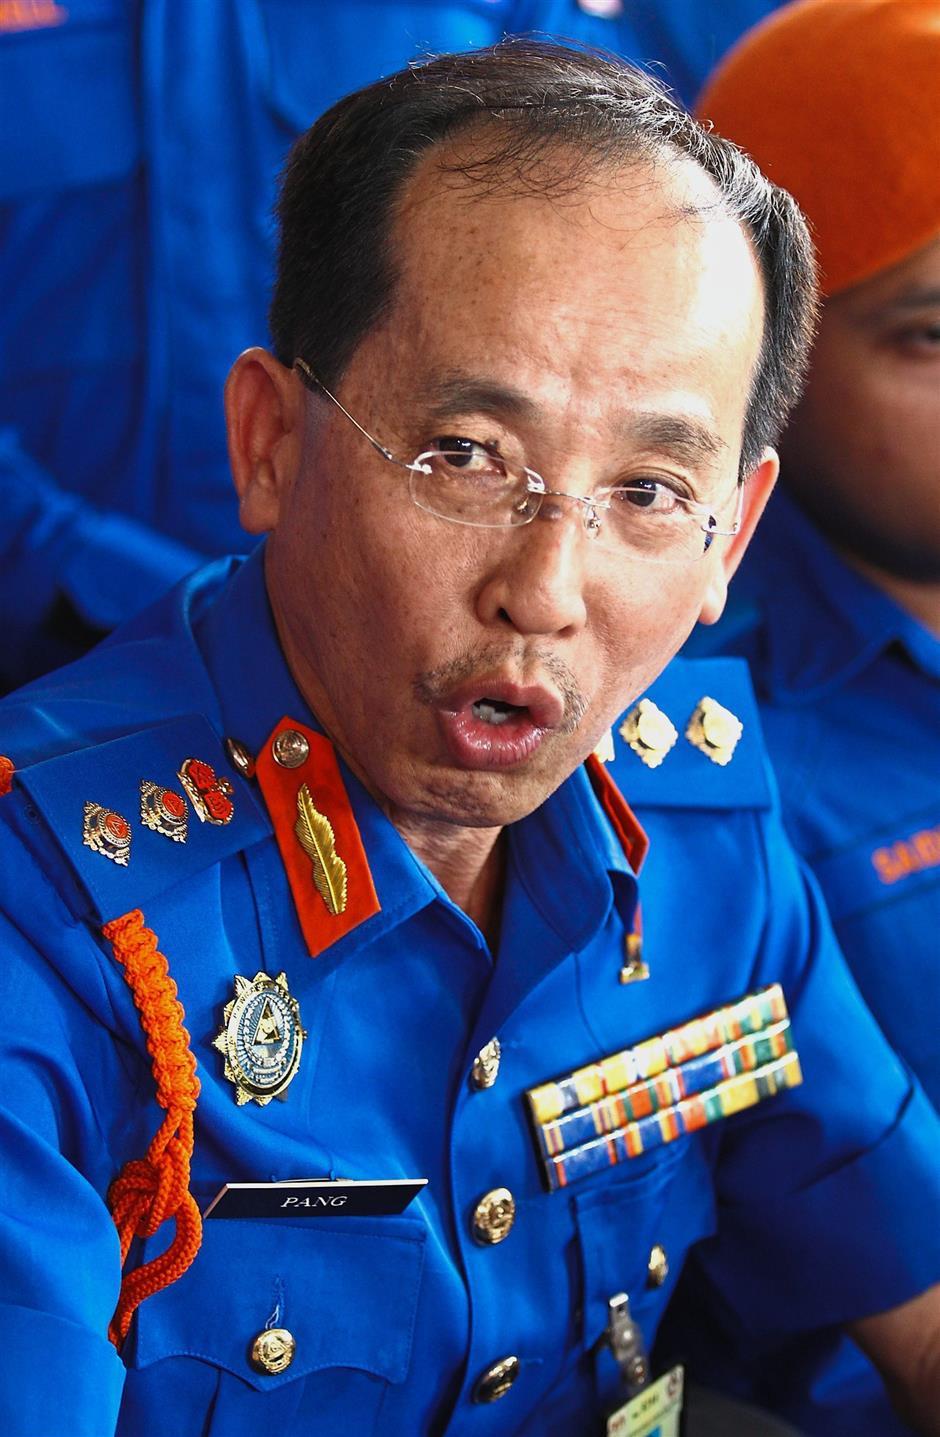 Penang Civil Defence Force director Kol (P.A.) Pang Ah Lek is bestowed the PKT award.